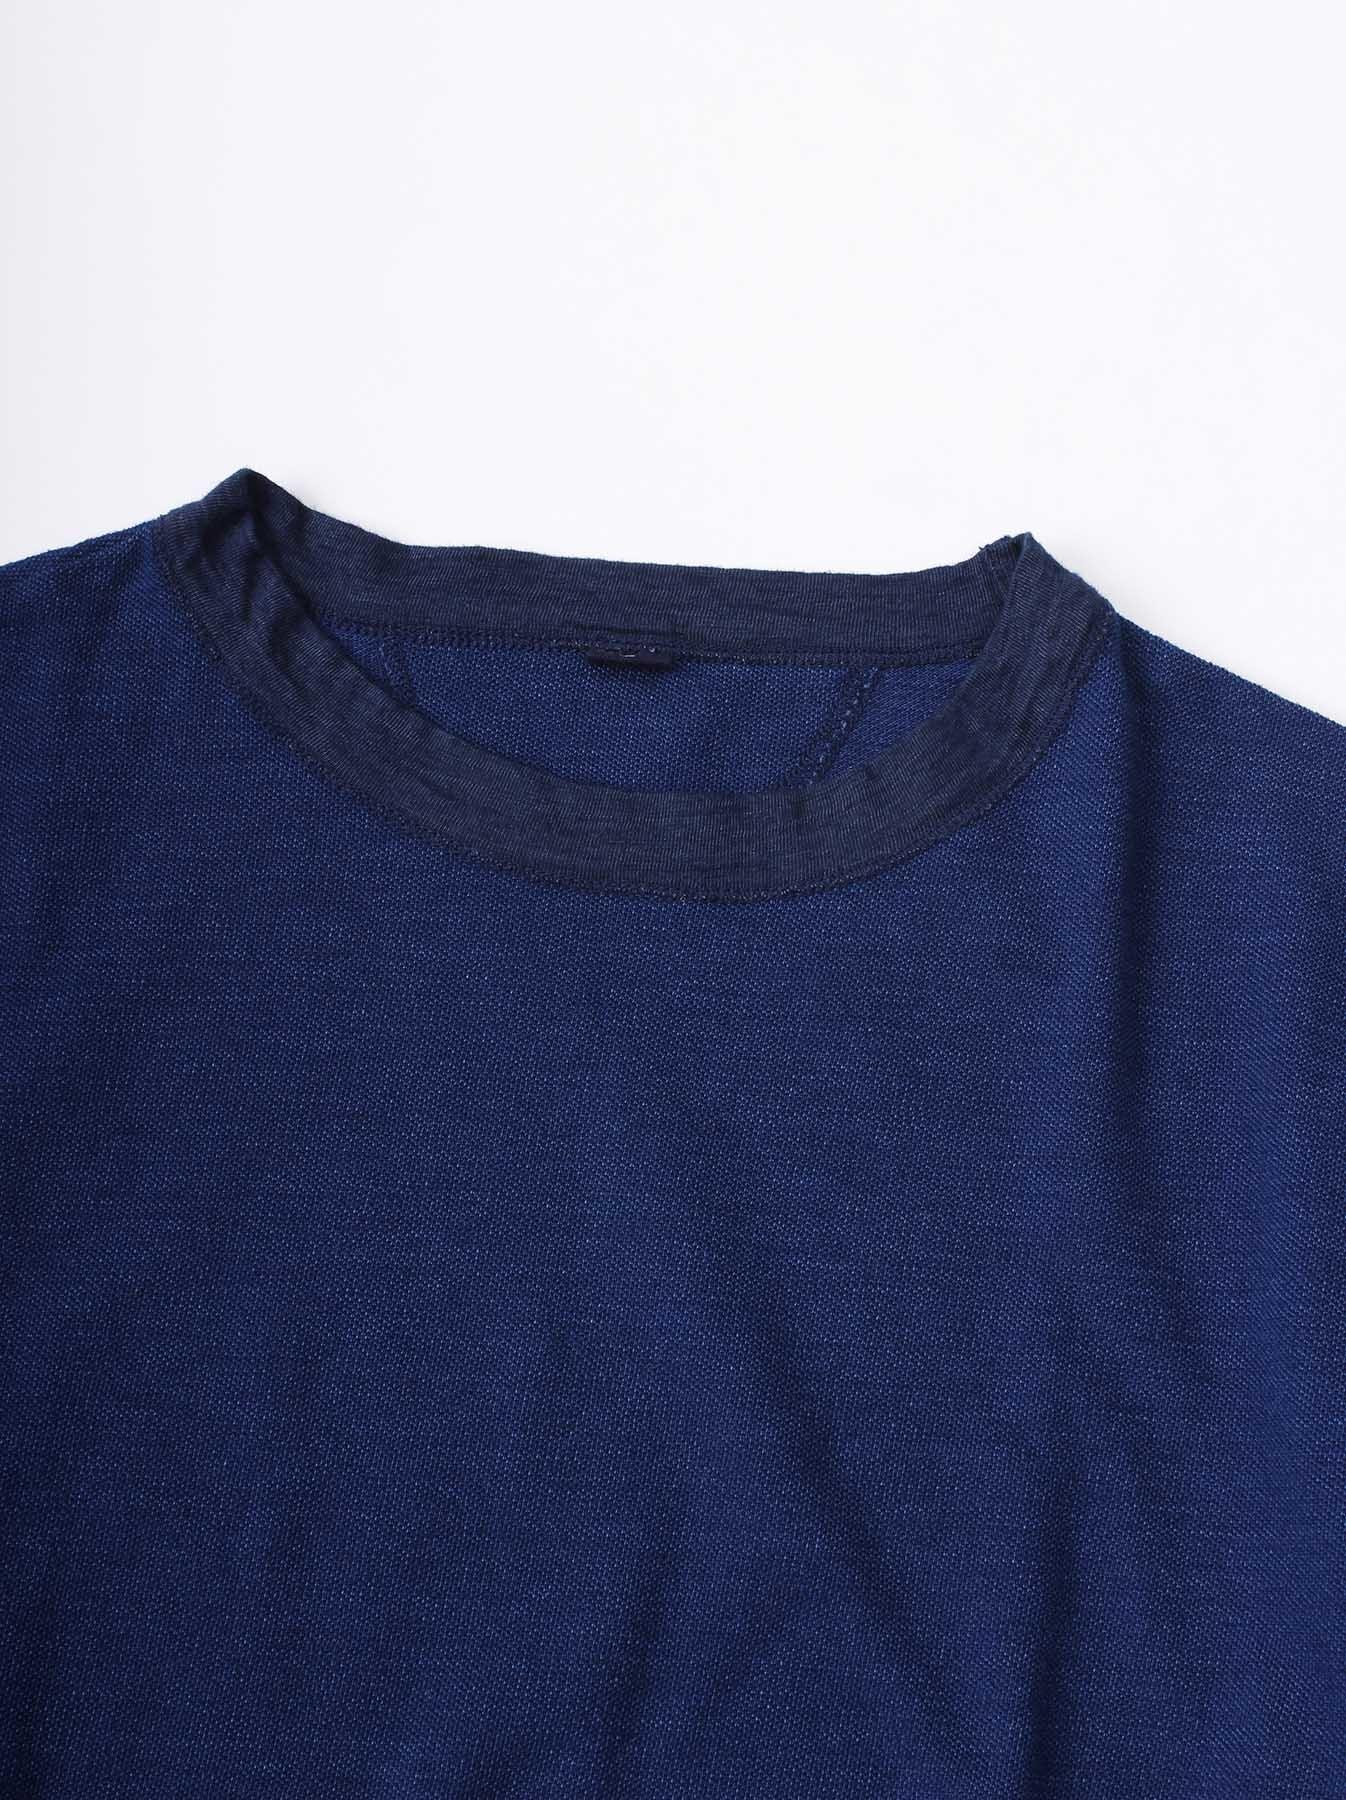 WH Indigo Ultimate Pique T-shirt Distressed-6